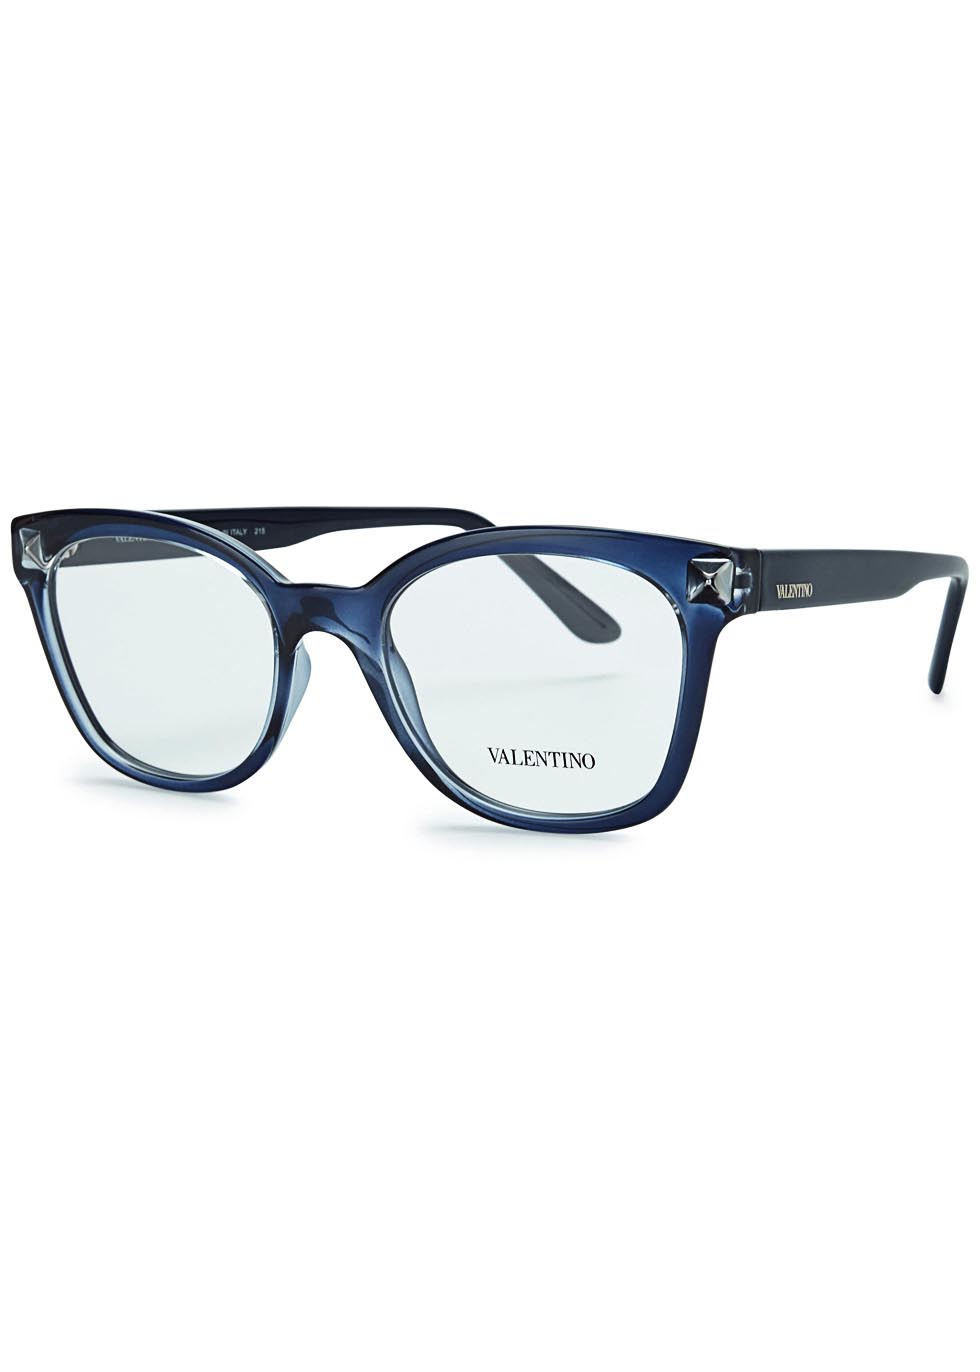 Blue wayfarer-style optical glasses - Valentino Garavani